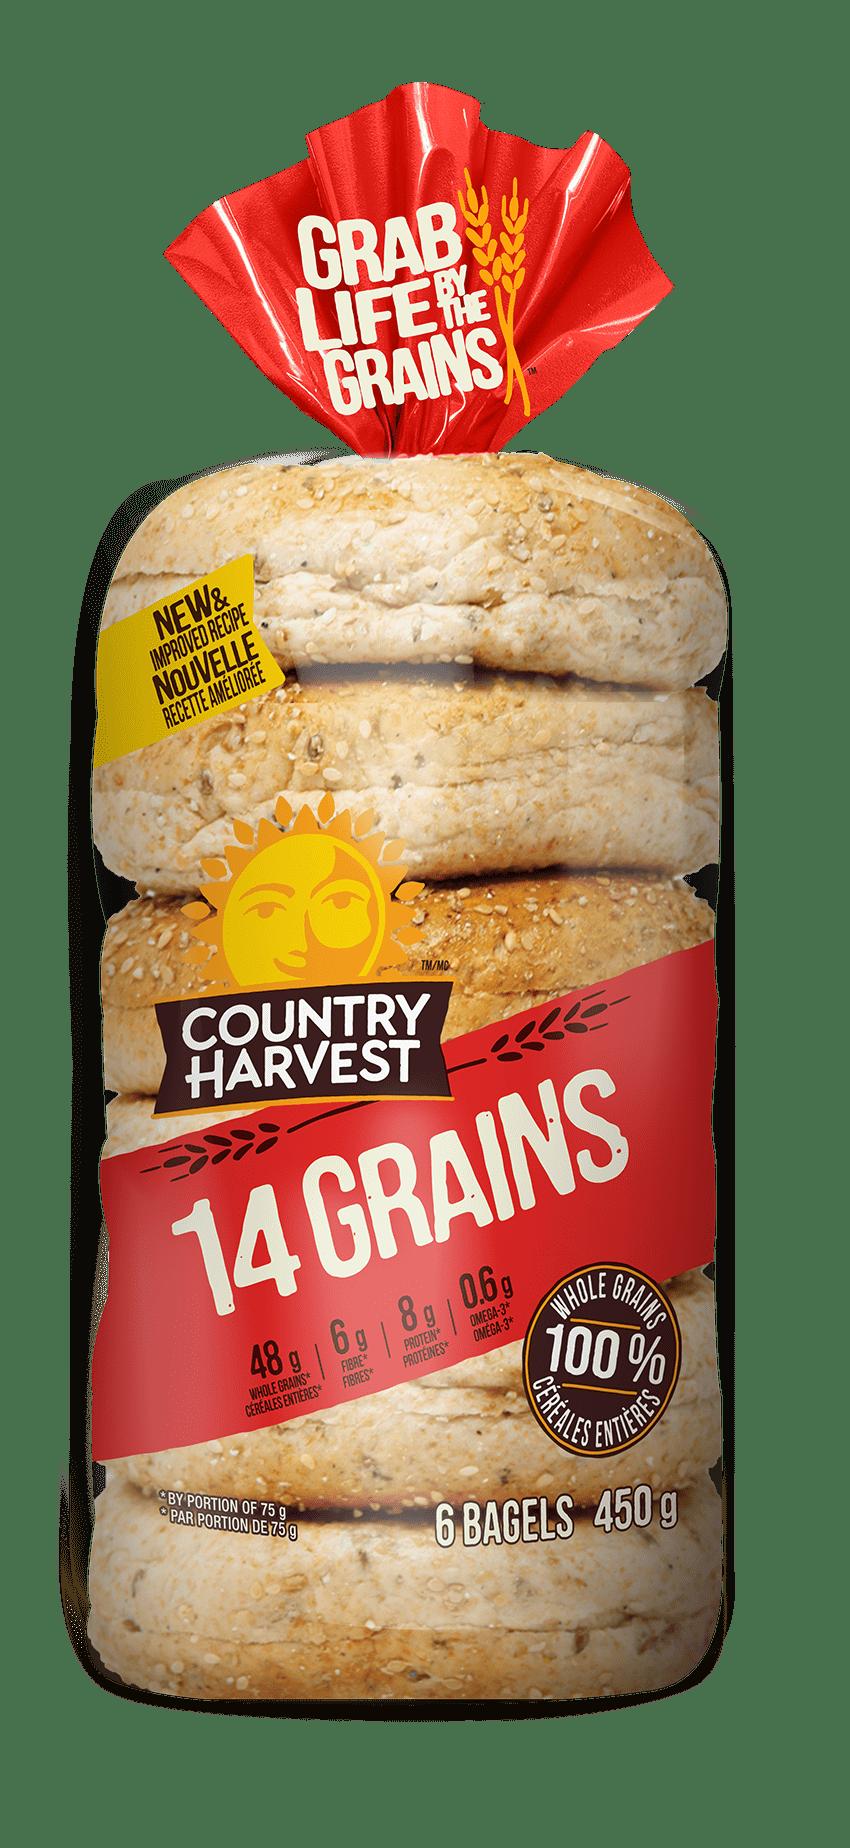 Country Harvest 14 Grains Bagels